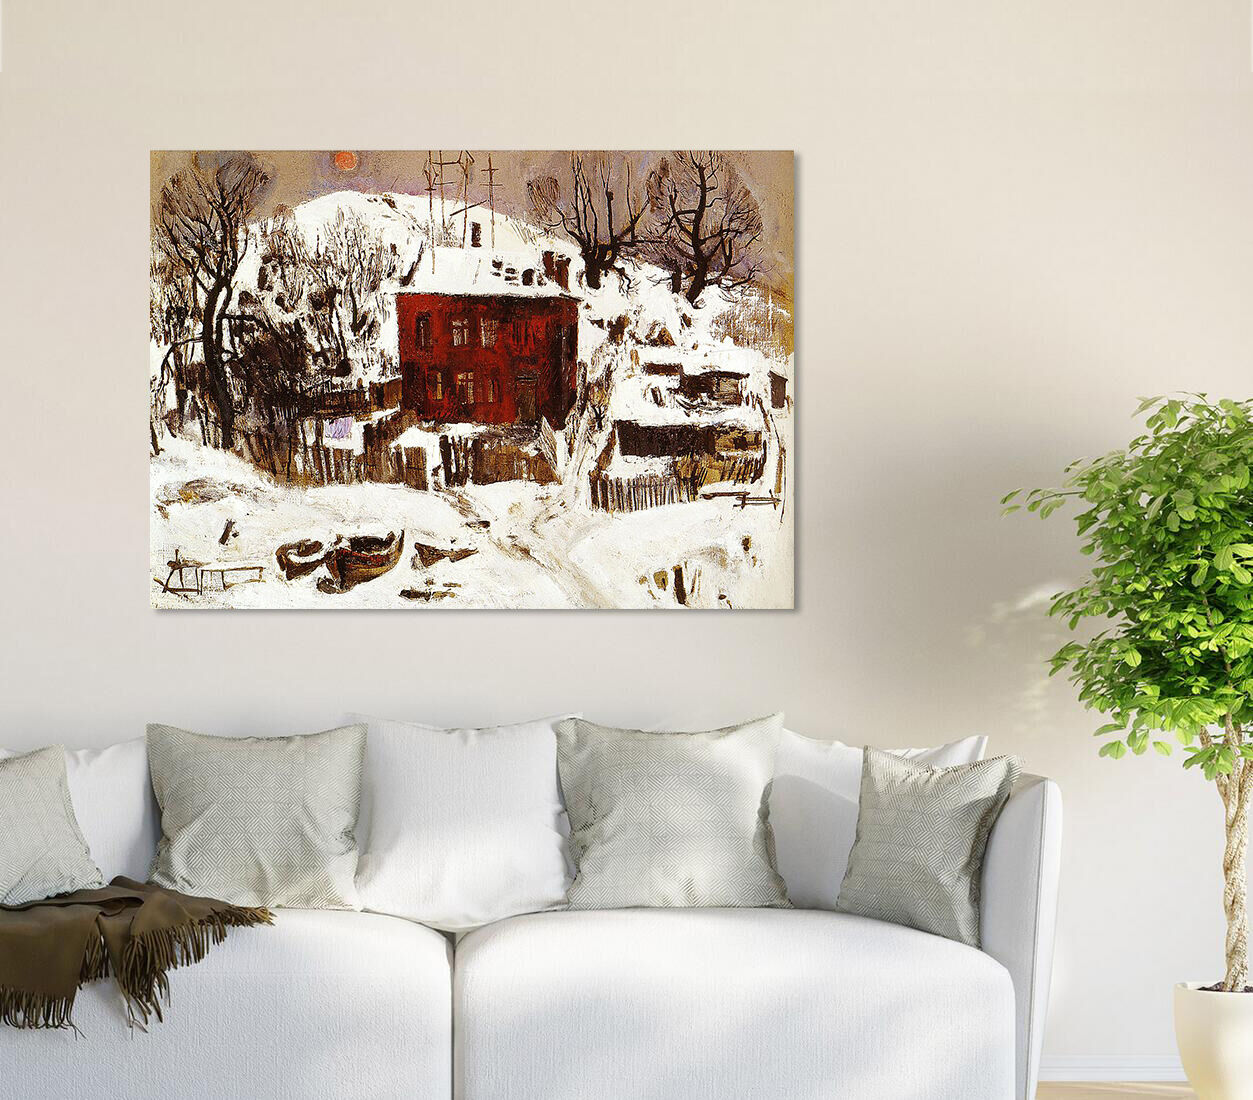 3D Schnee, Haus 536 Wandbild Fototapete BildTapete Familie AJSTORE DE